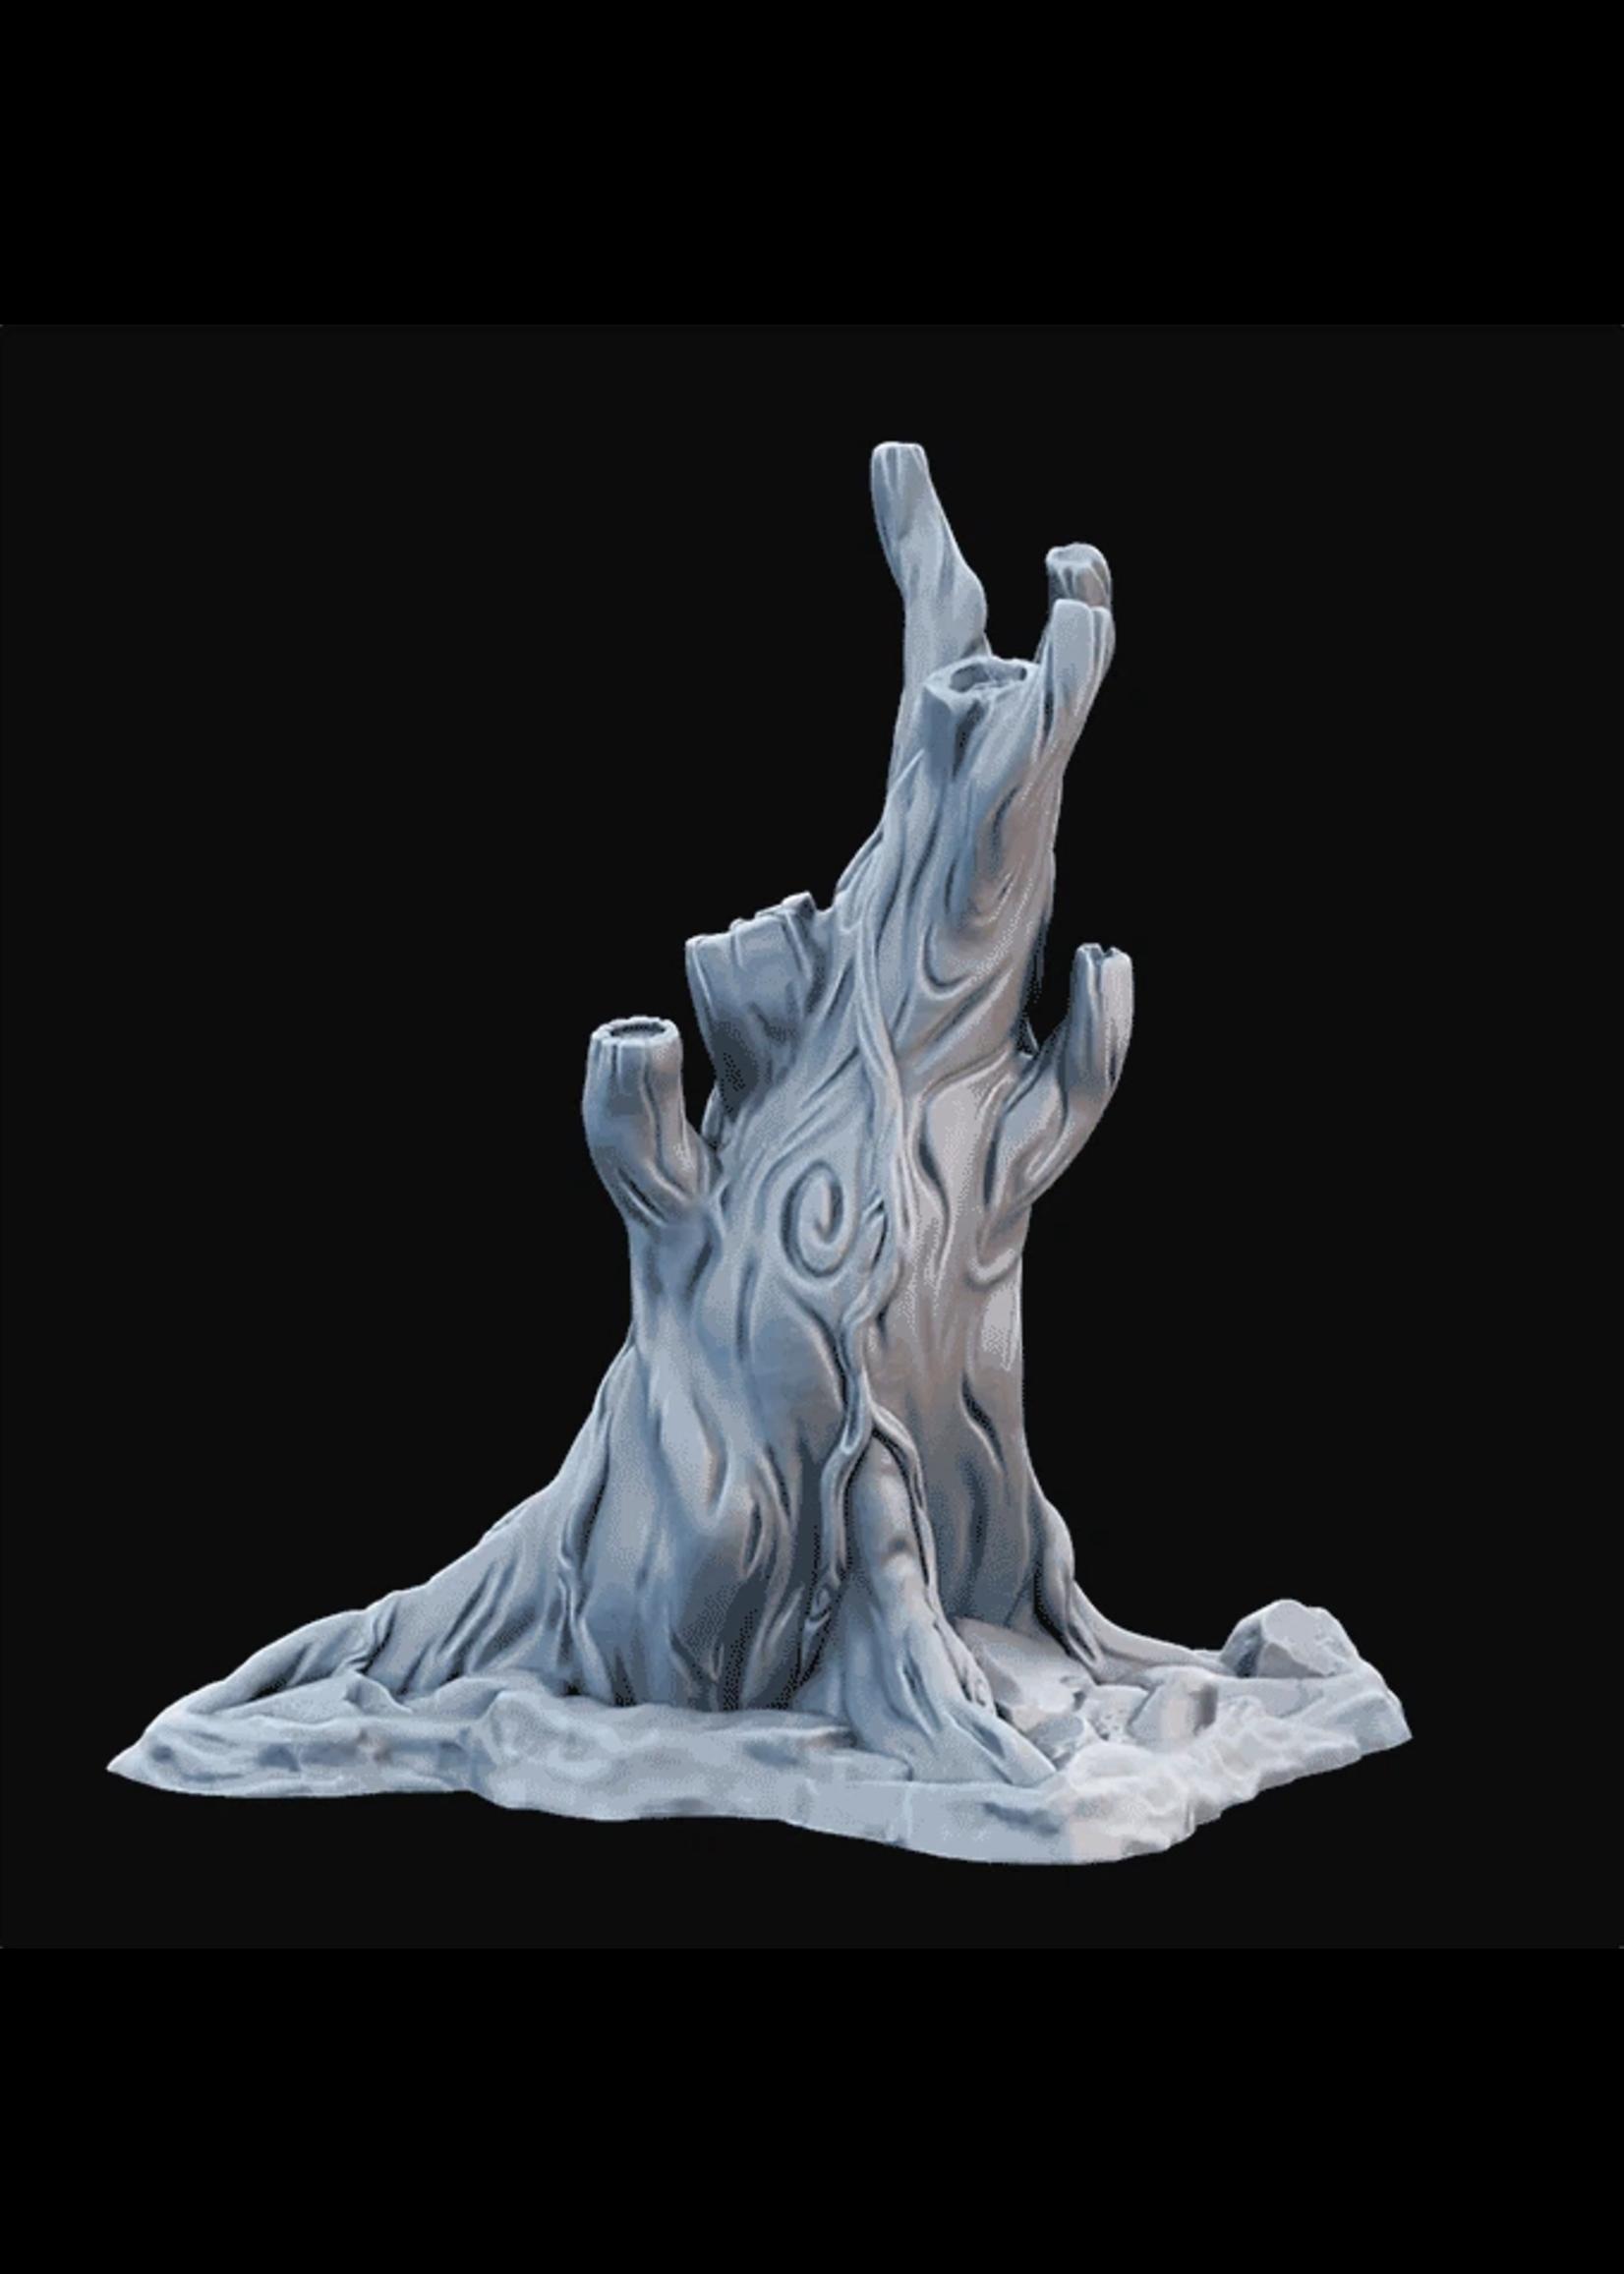 3D Printed Miniature - Tree02.Stl - Dungeons & Dragons - Desolate Plains KS